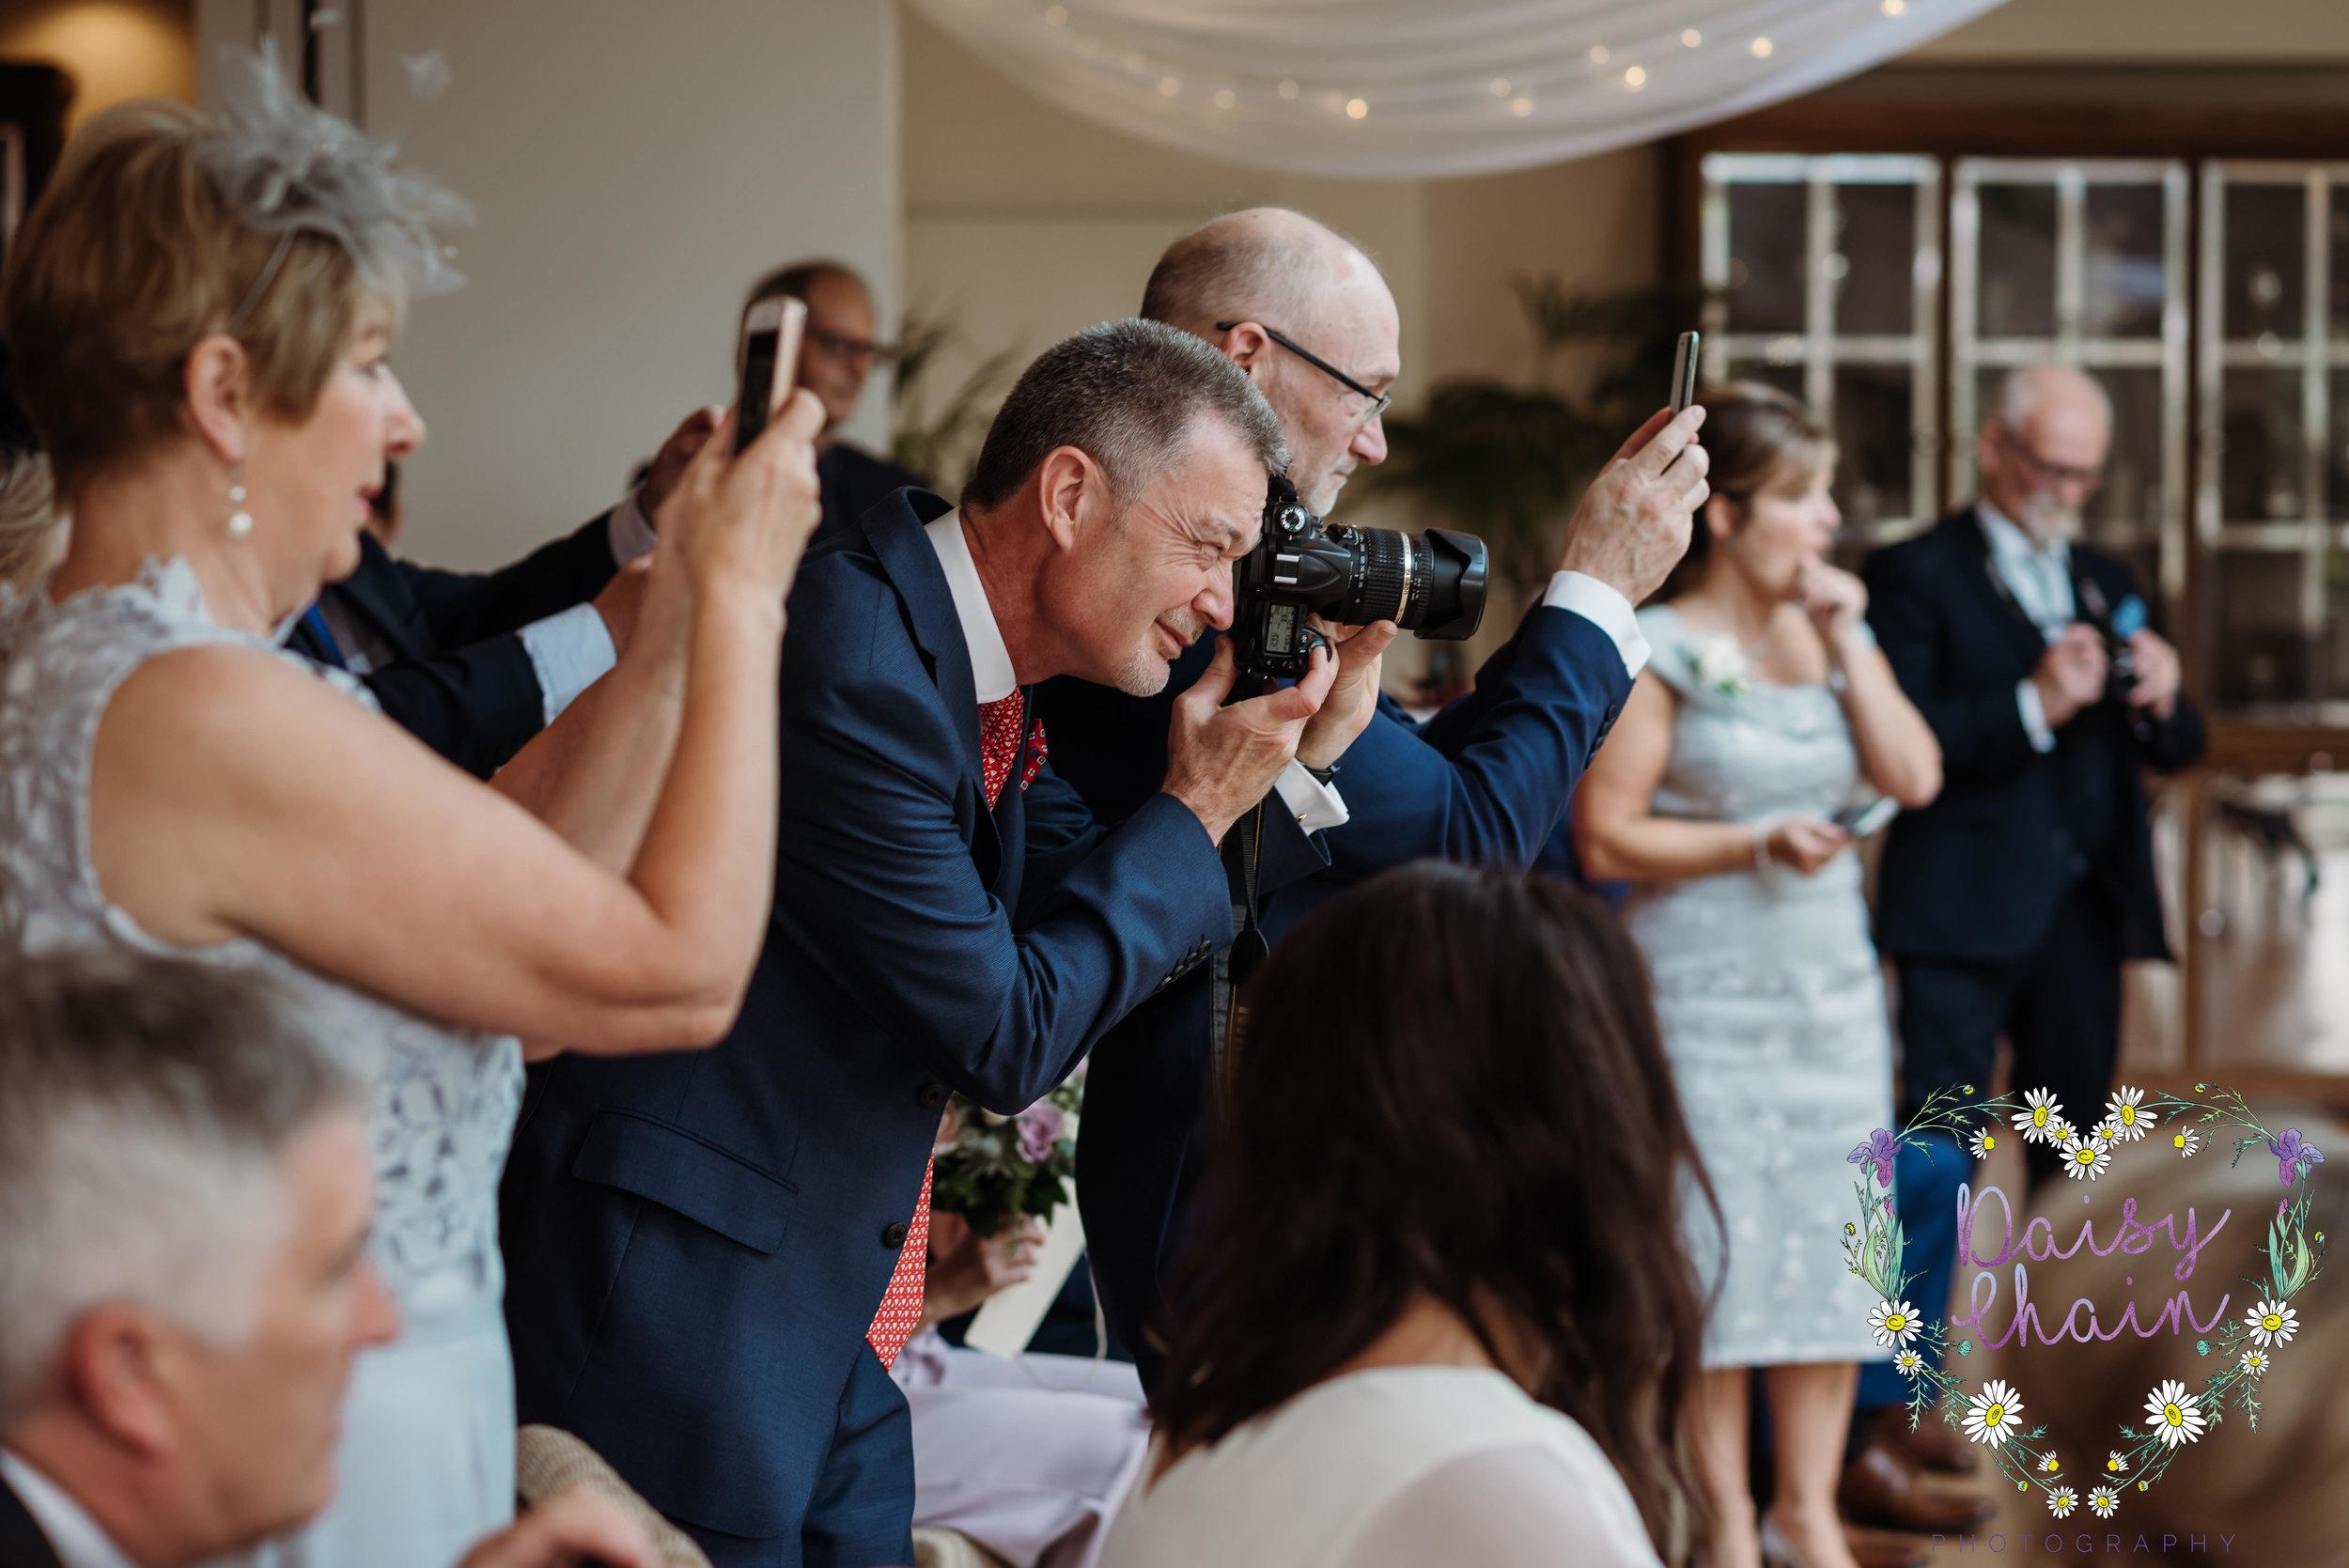 wedding guests with cameras